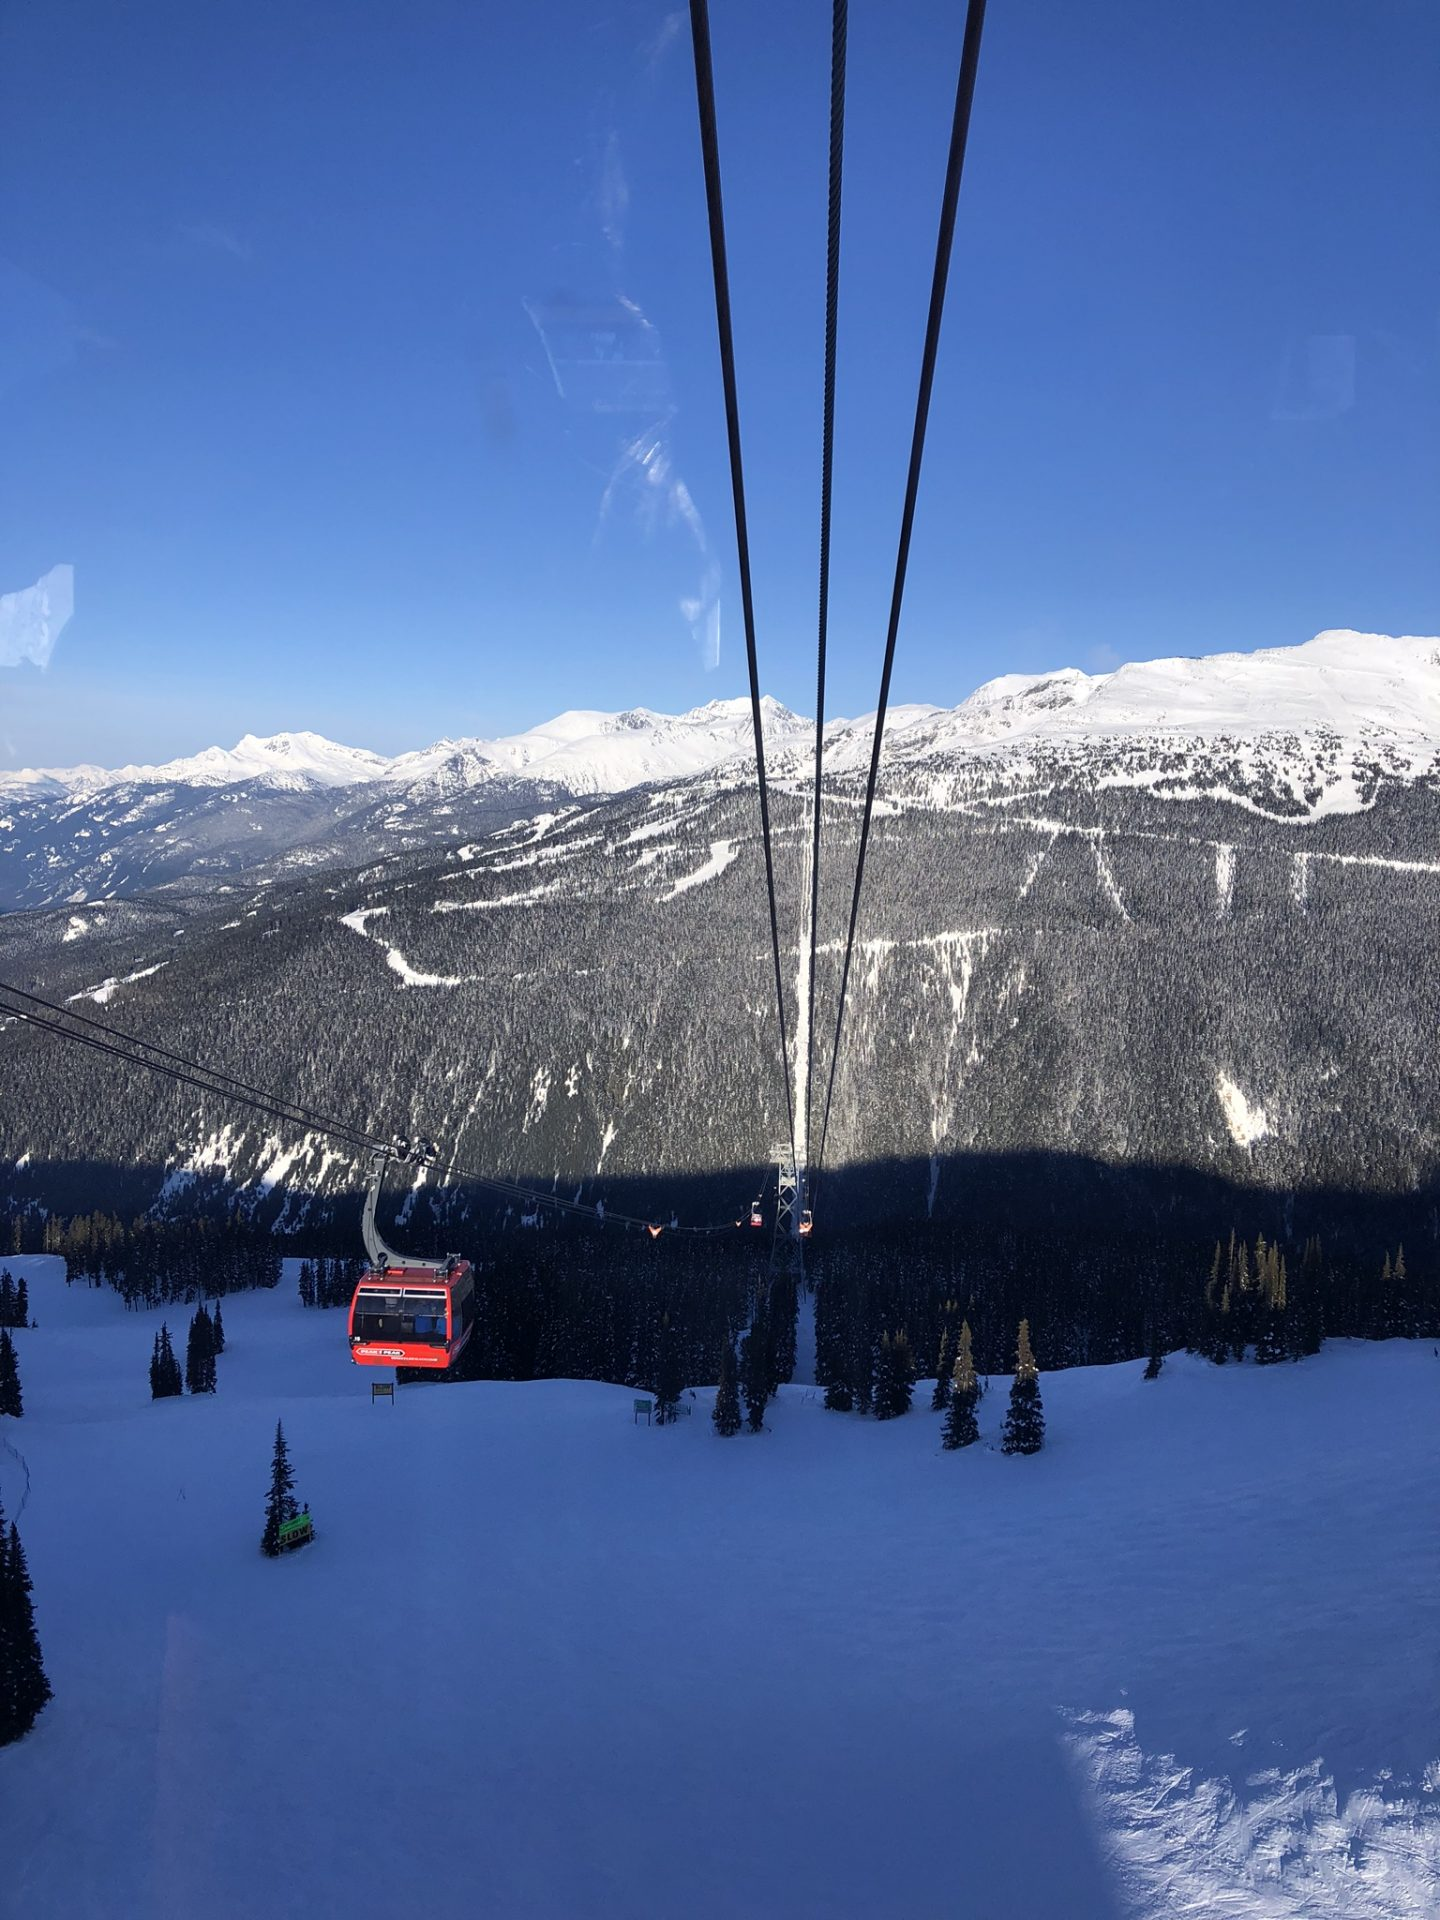 Peak to Peak Gondola, Whistler, British Columbia